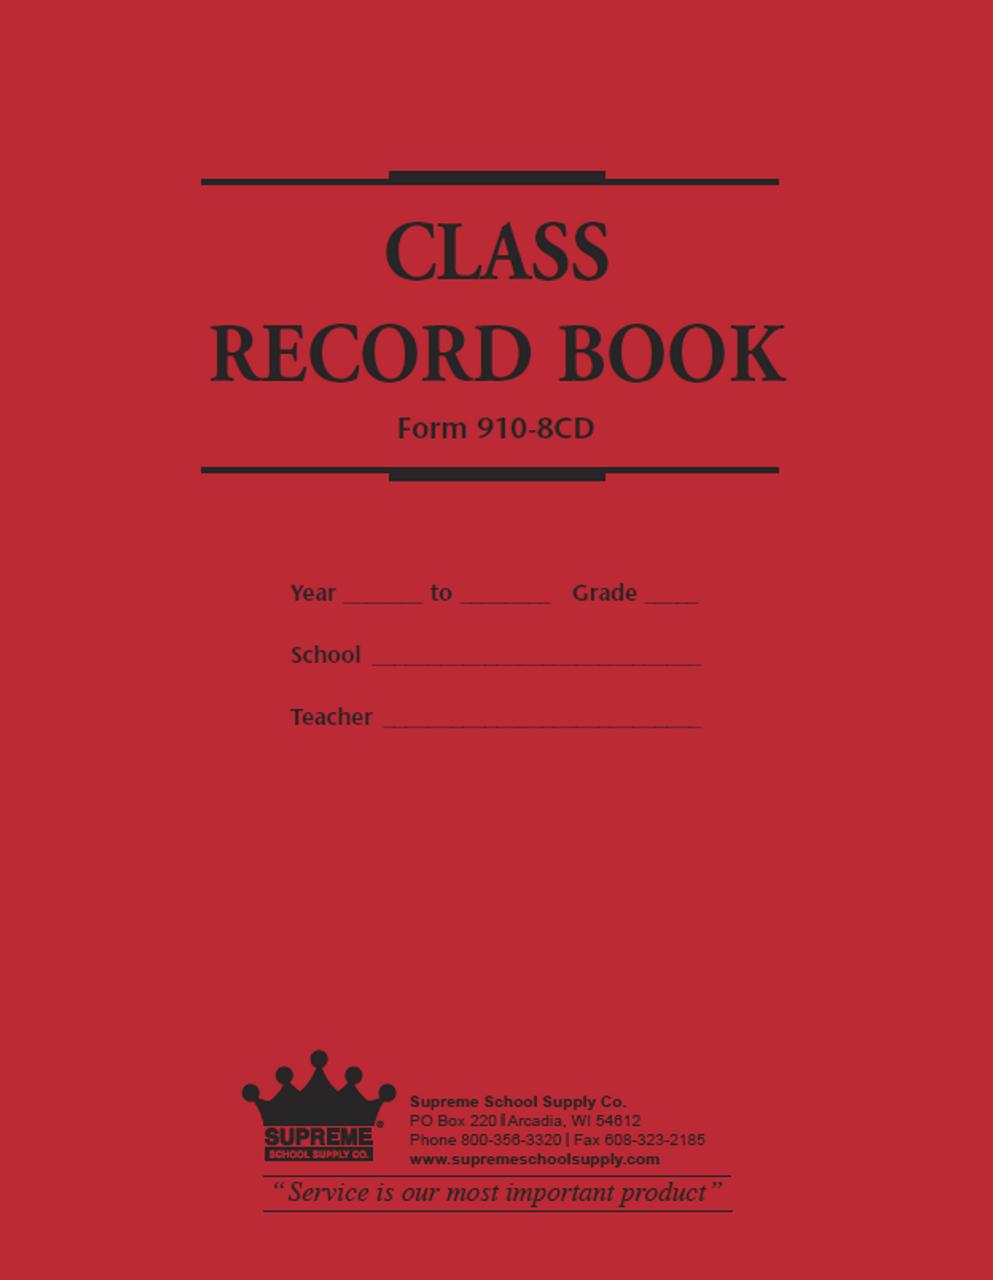 Class Record & Duplicate Plan Book (910-8CD)